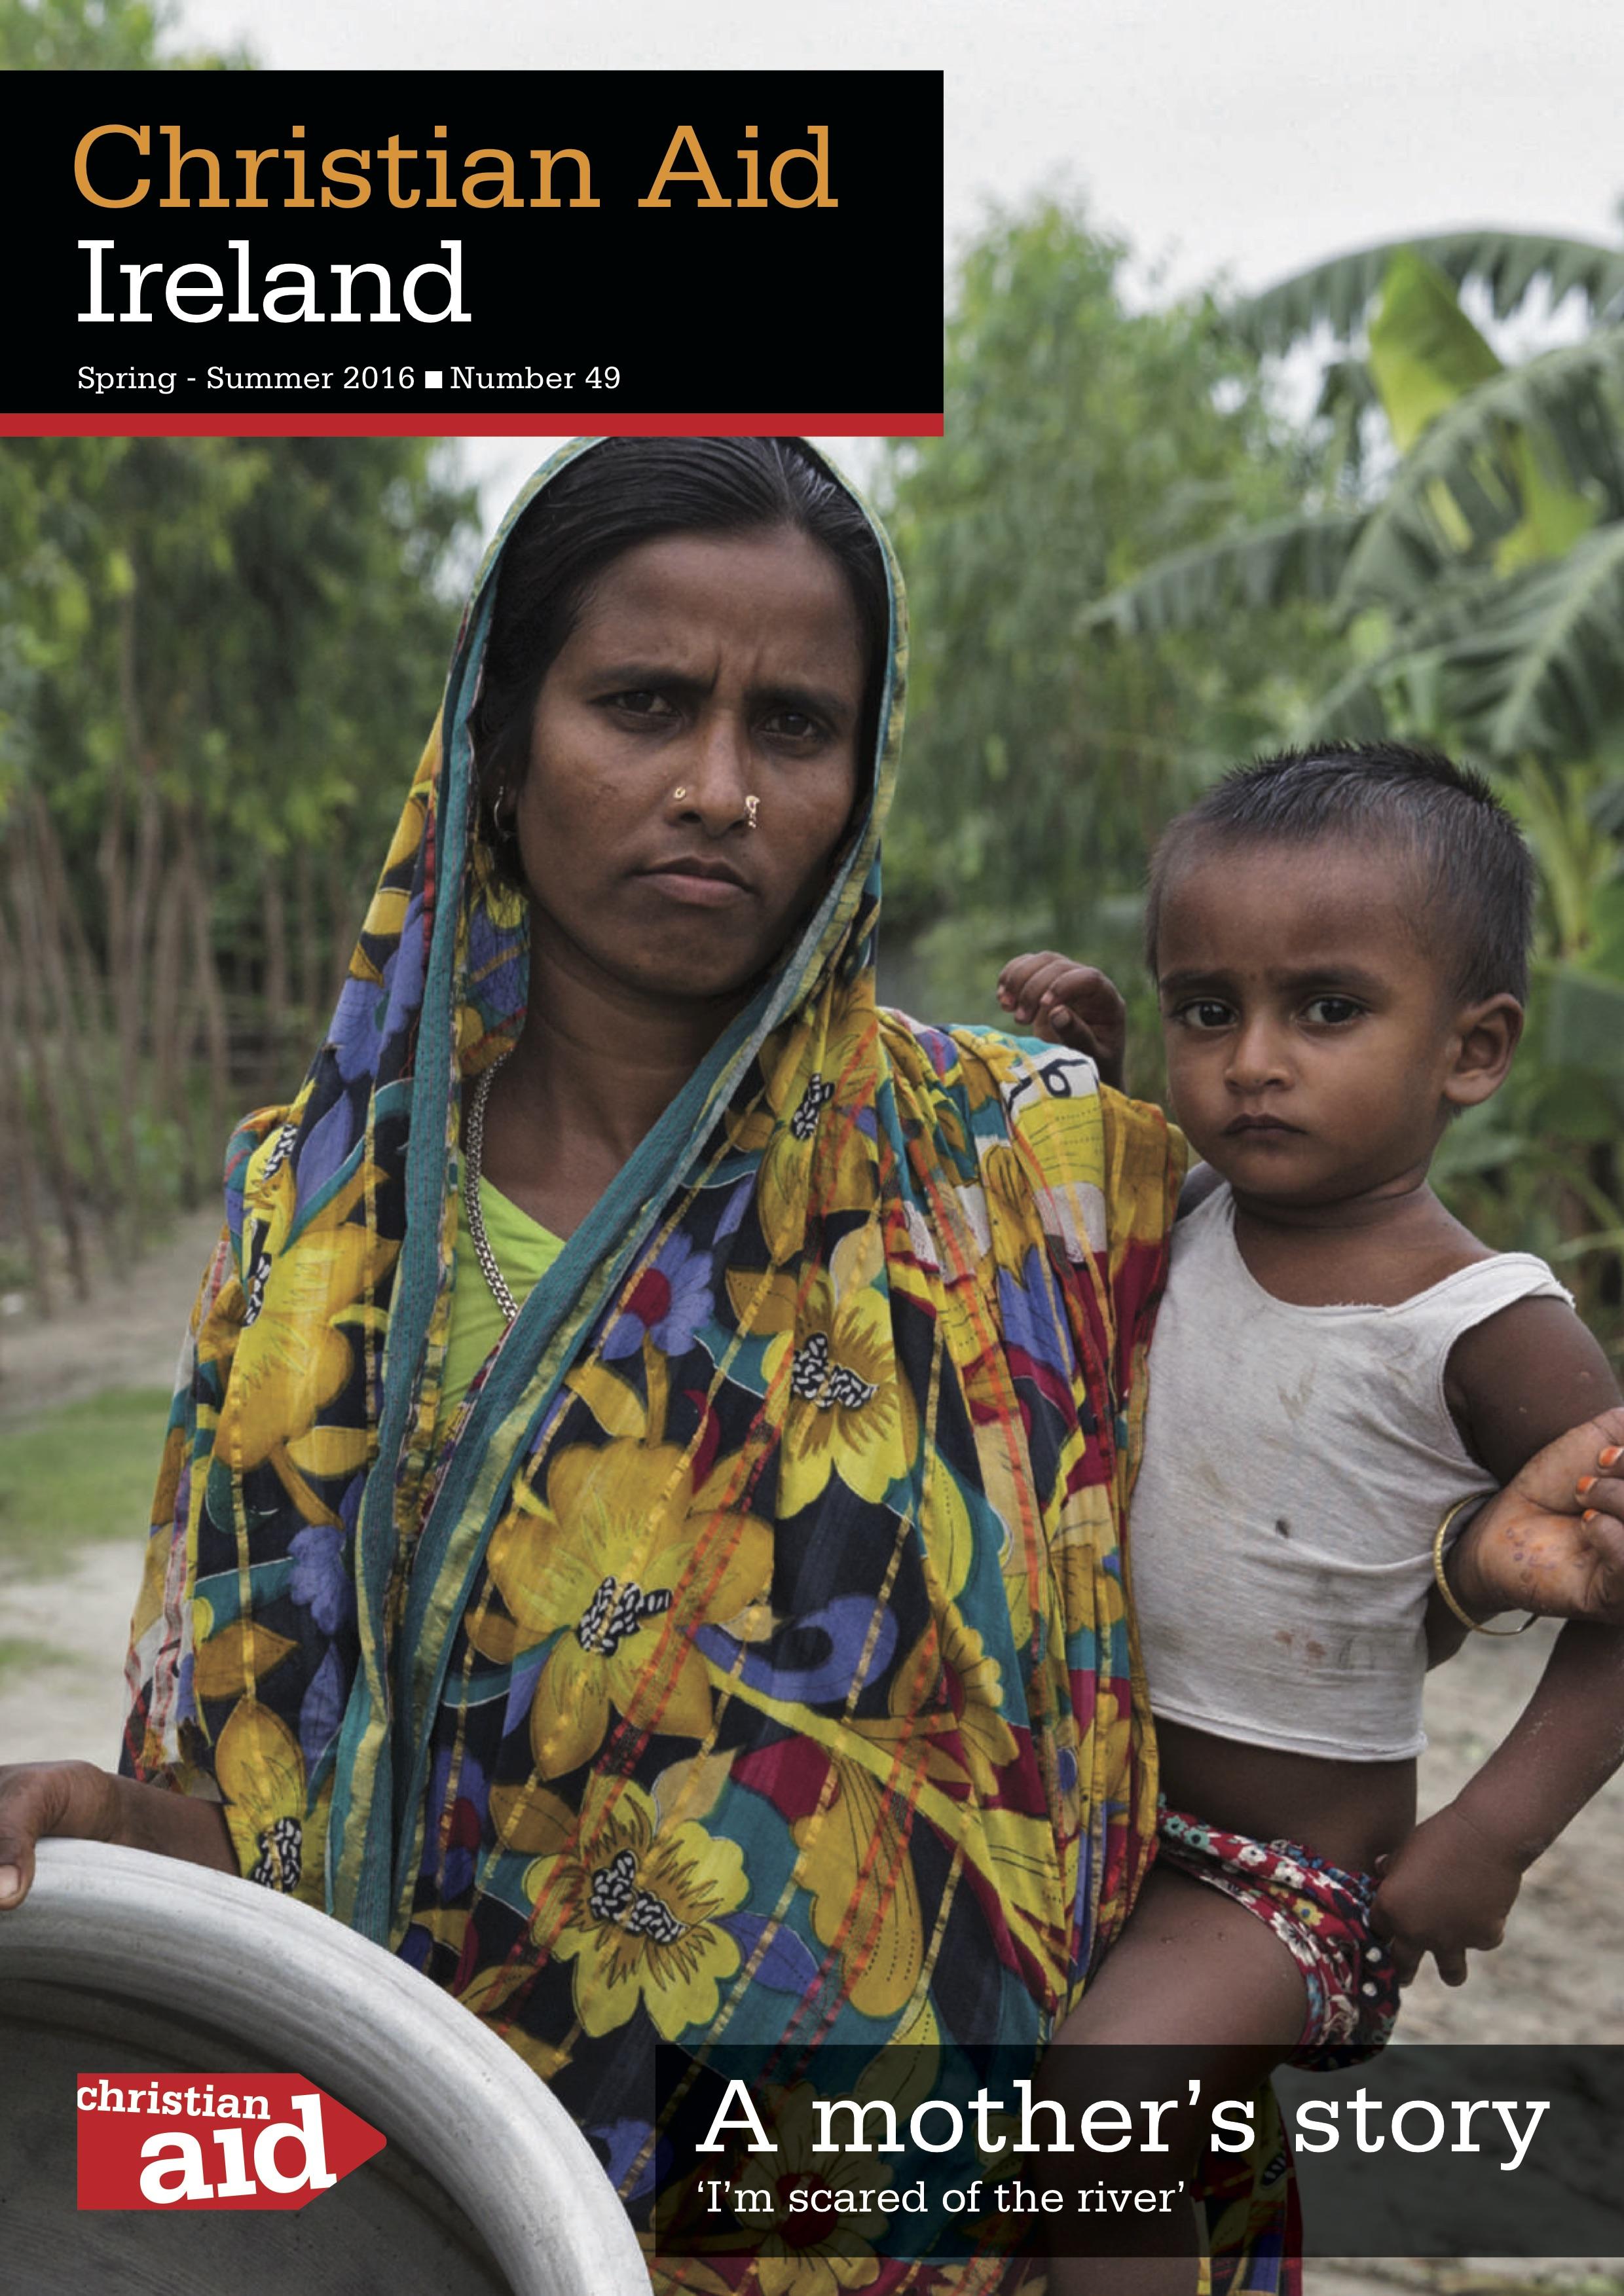 Christian Aid Ireland highlight displacement around the world